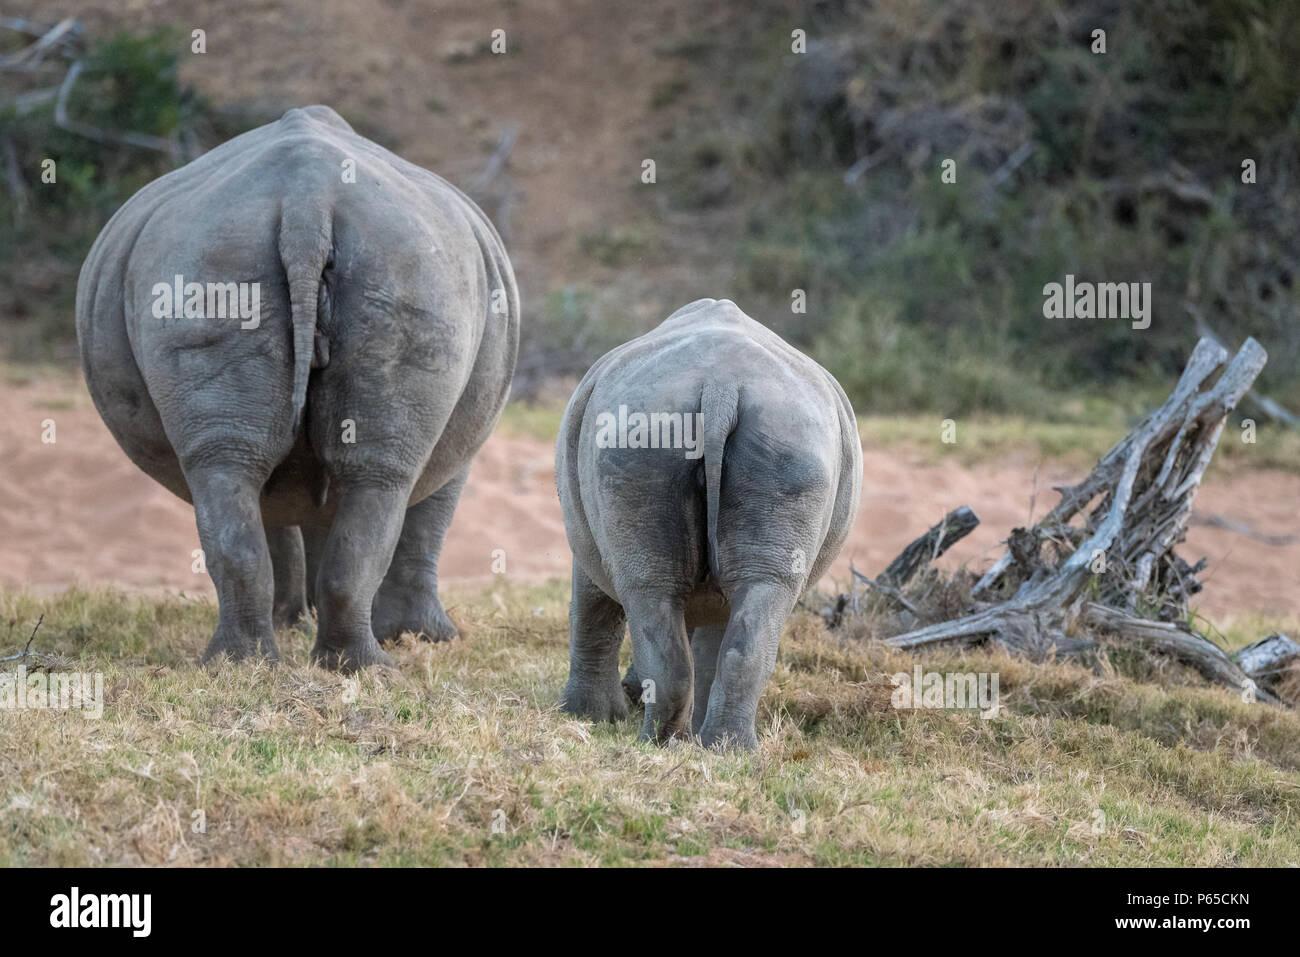 Paar Nashörner Blick nach hinten, Weiden Stockbild